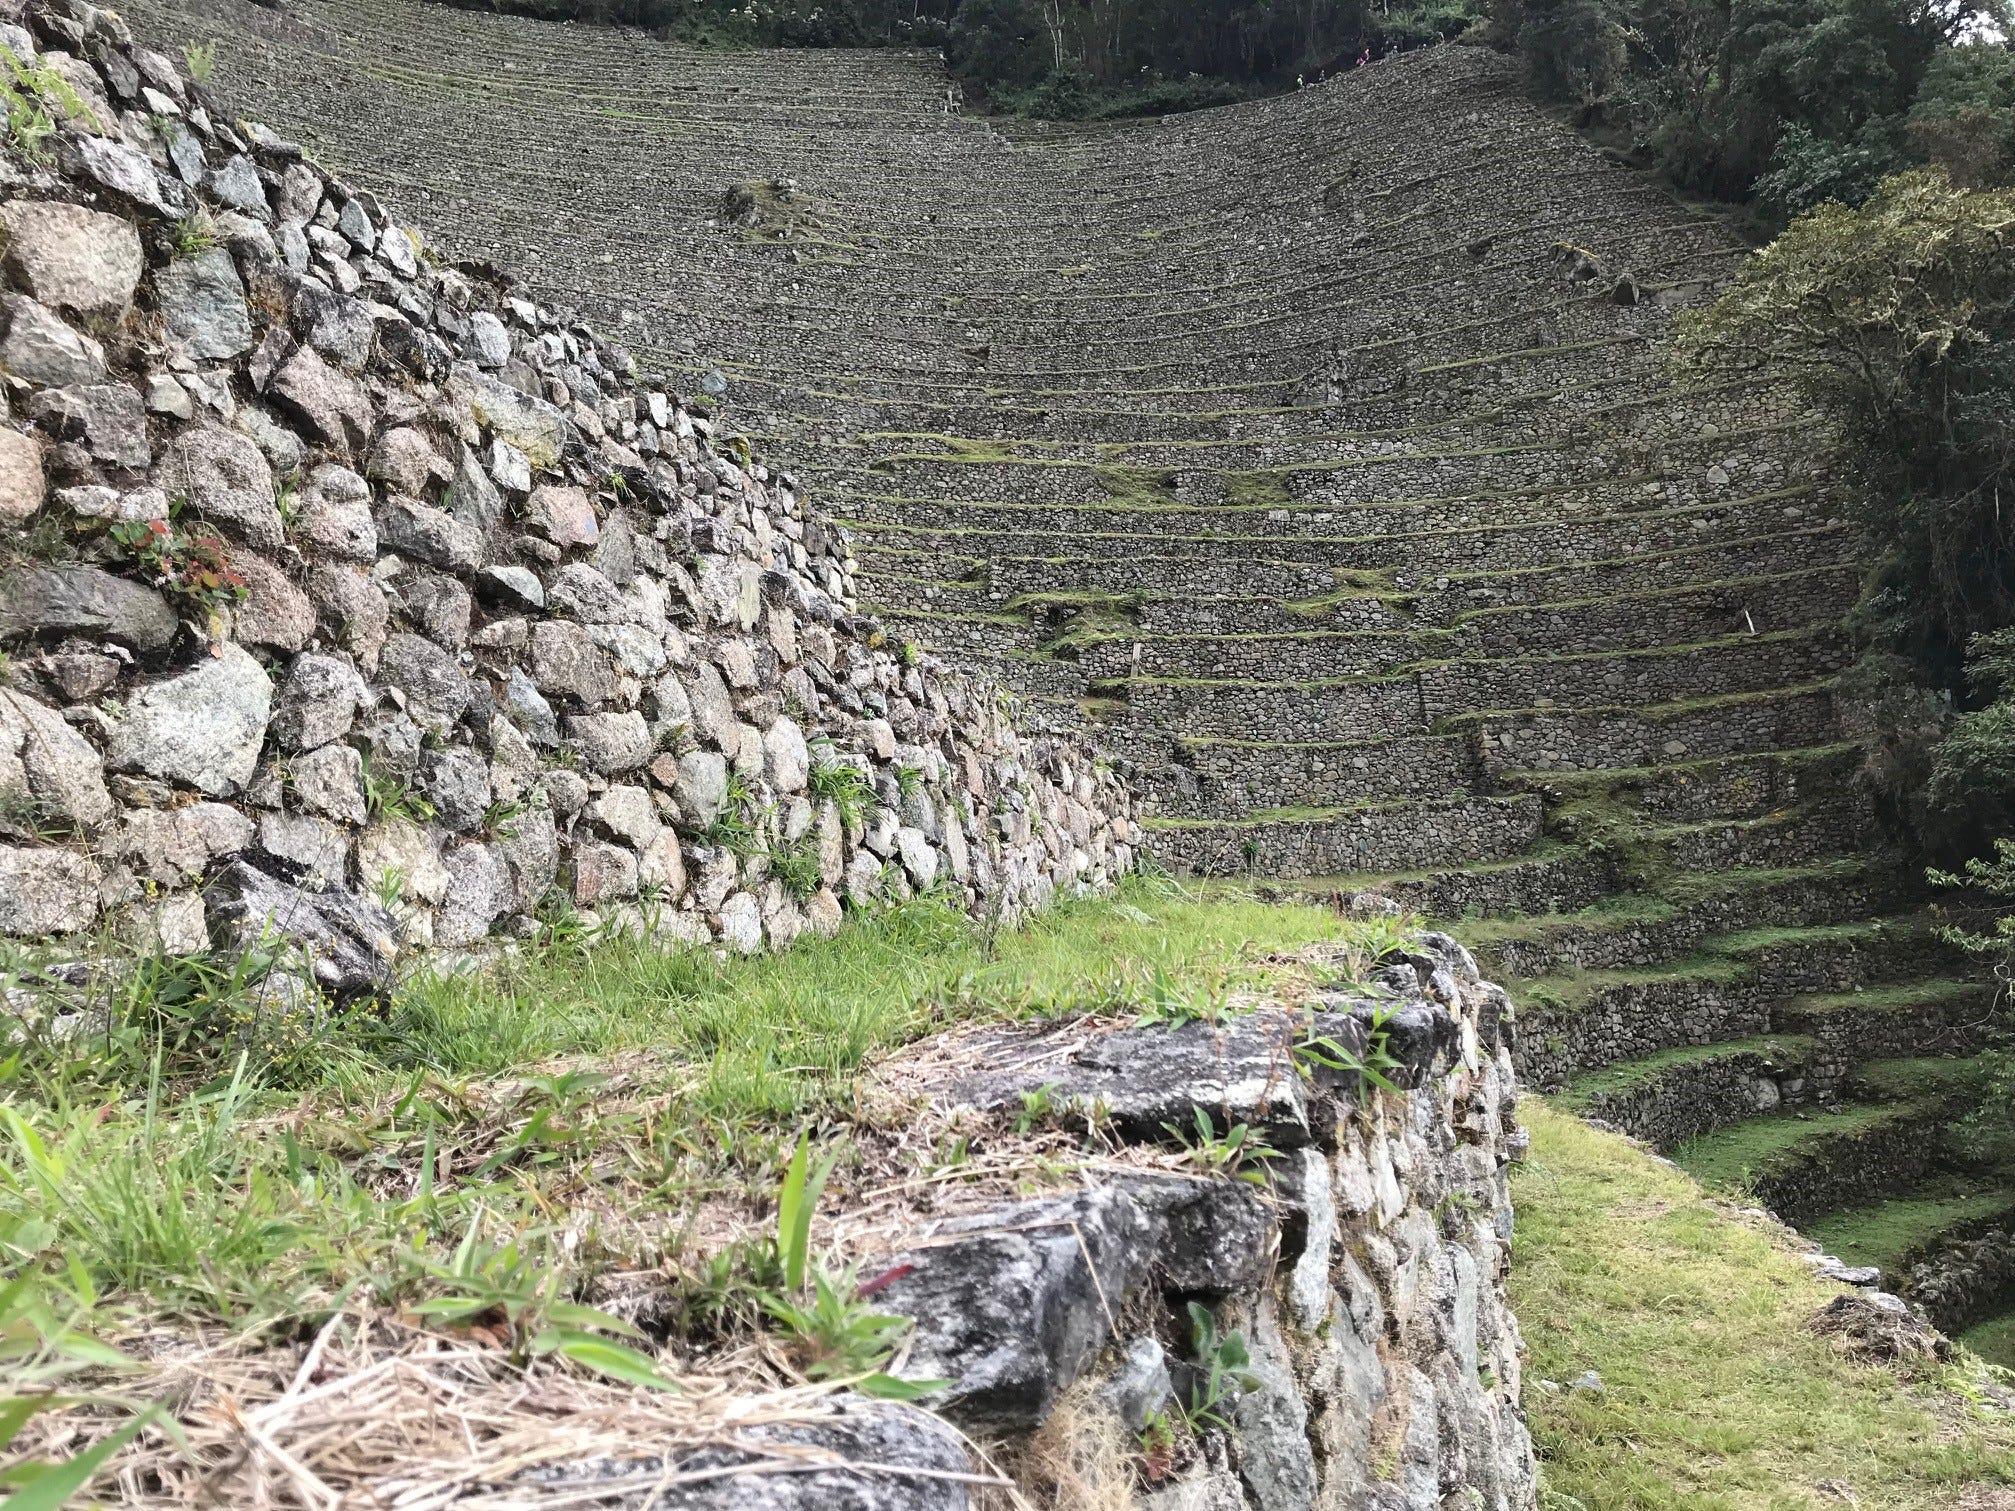 Inca terraces on the Inca Trail